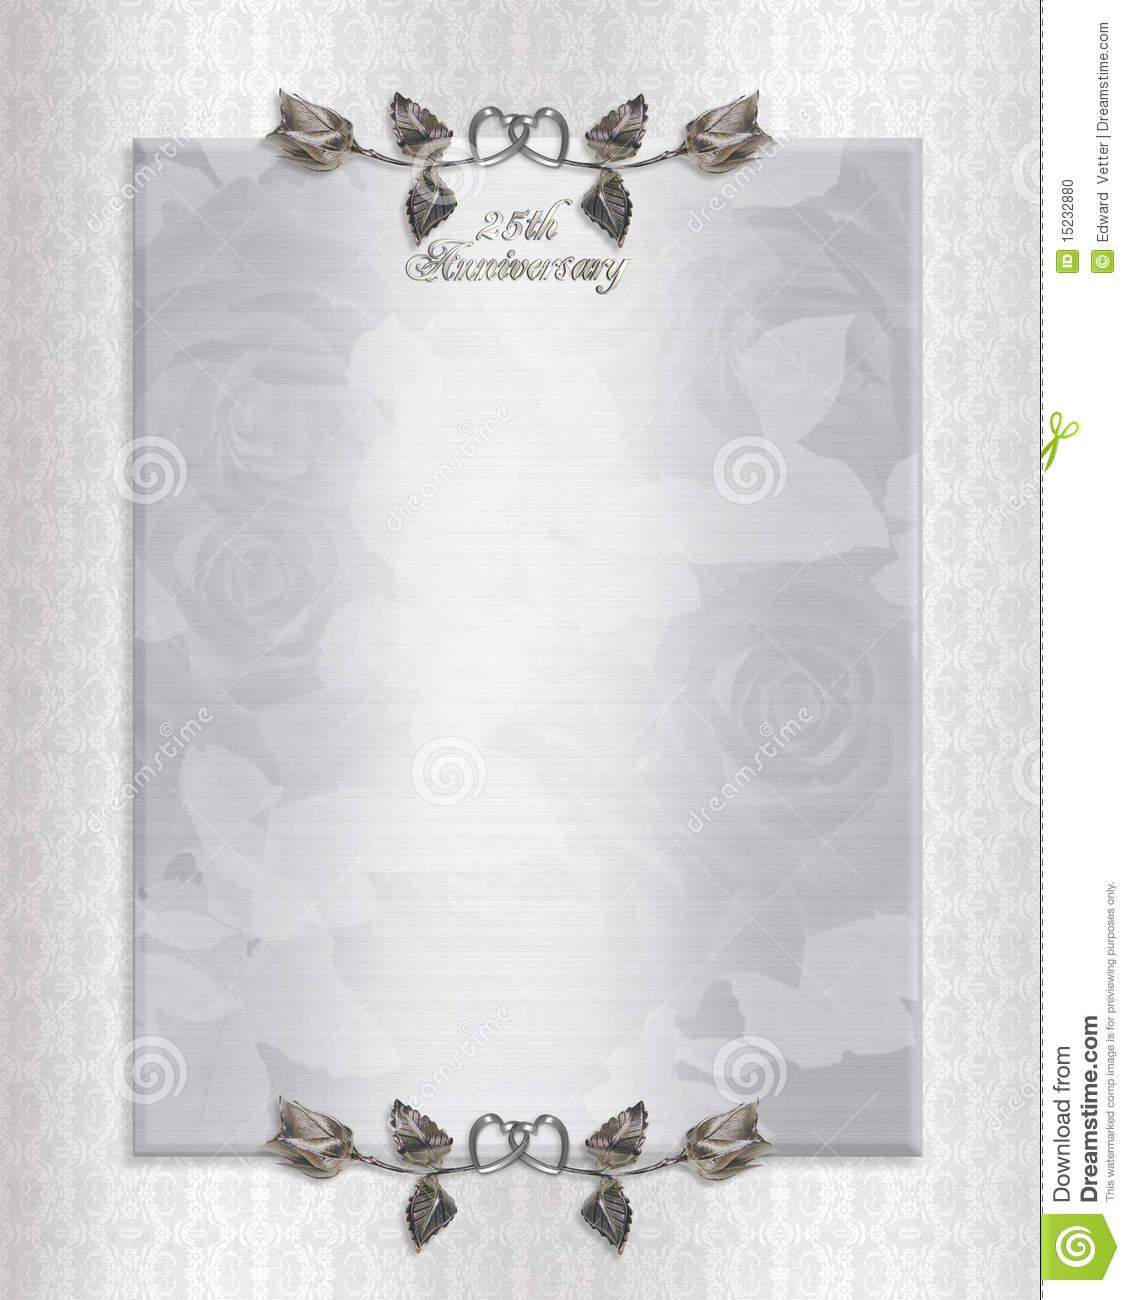 25th Wedding Anniversary Invitation Template